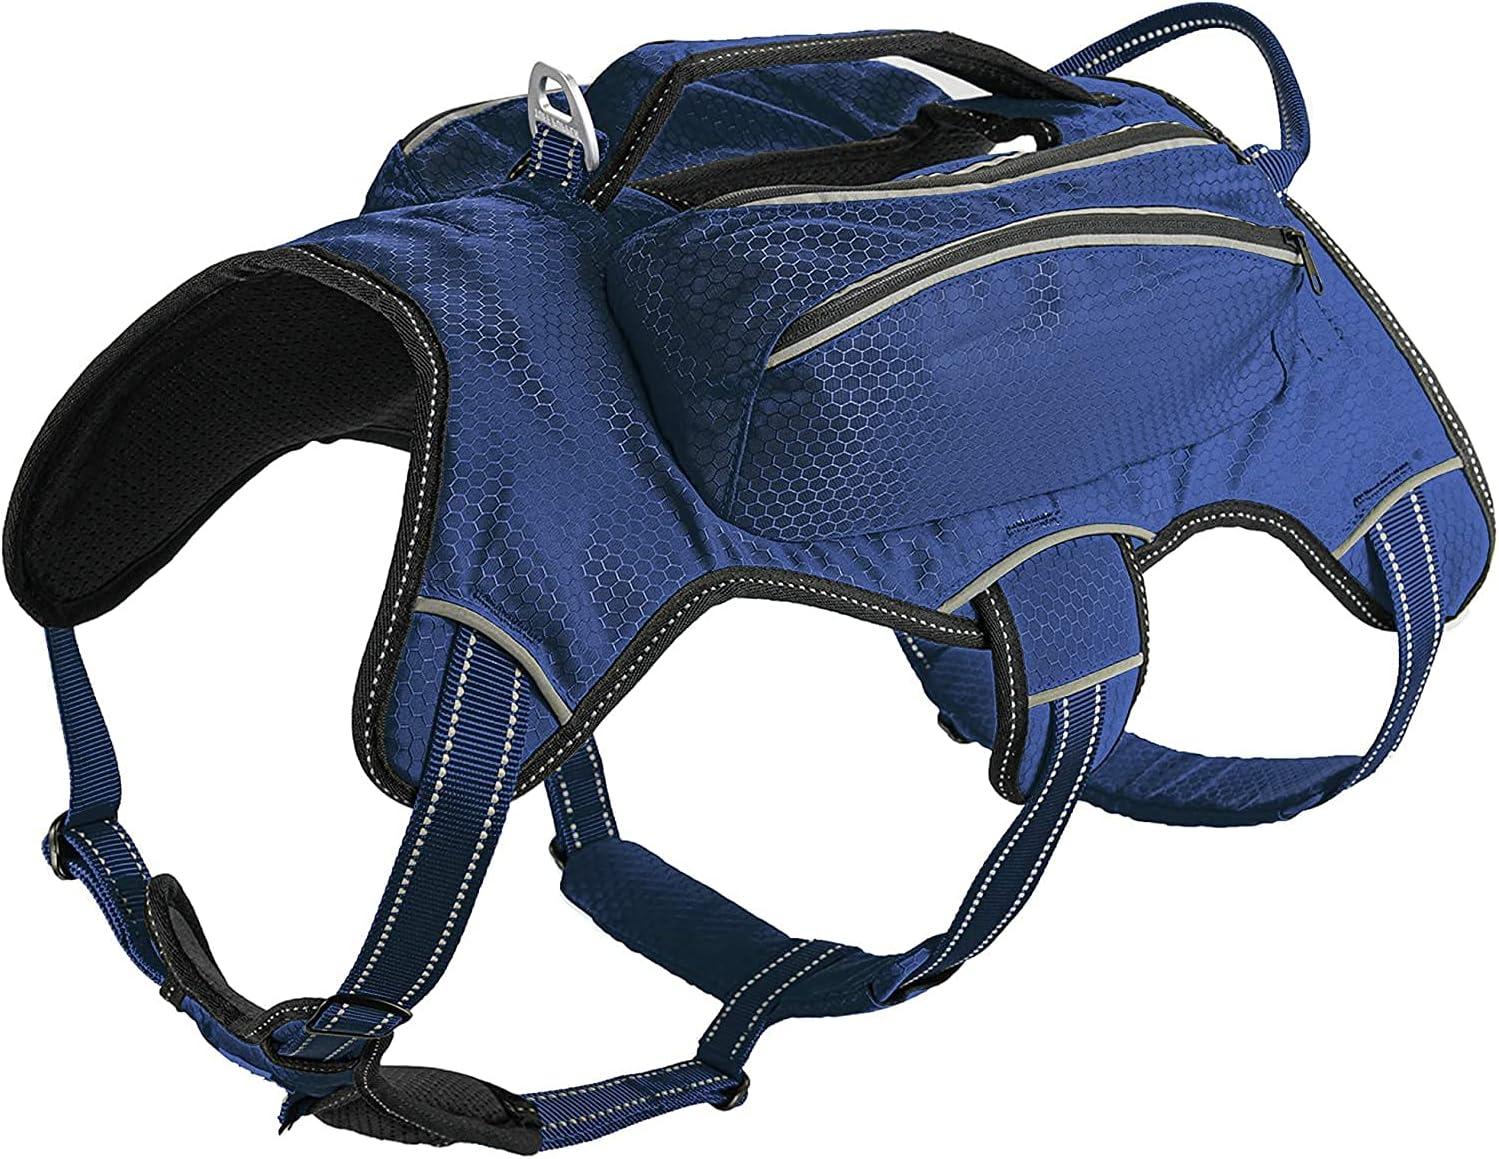 OFFicial site Tuff Pupper Dog Car Seat Belt Strap B Titan Alternative dealer - XL and Harness